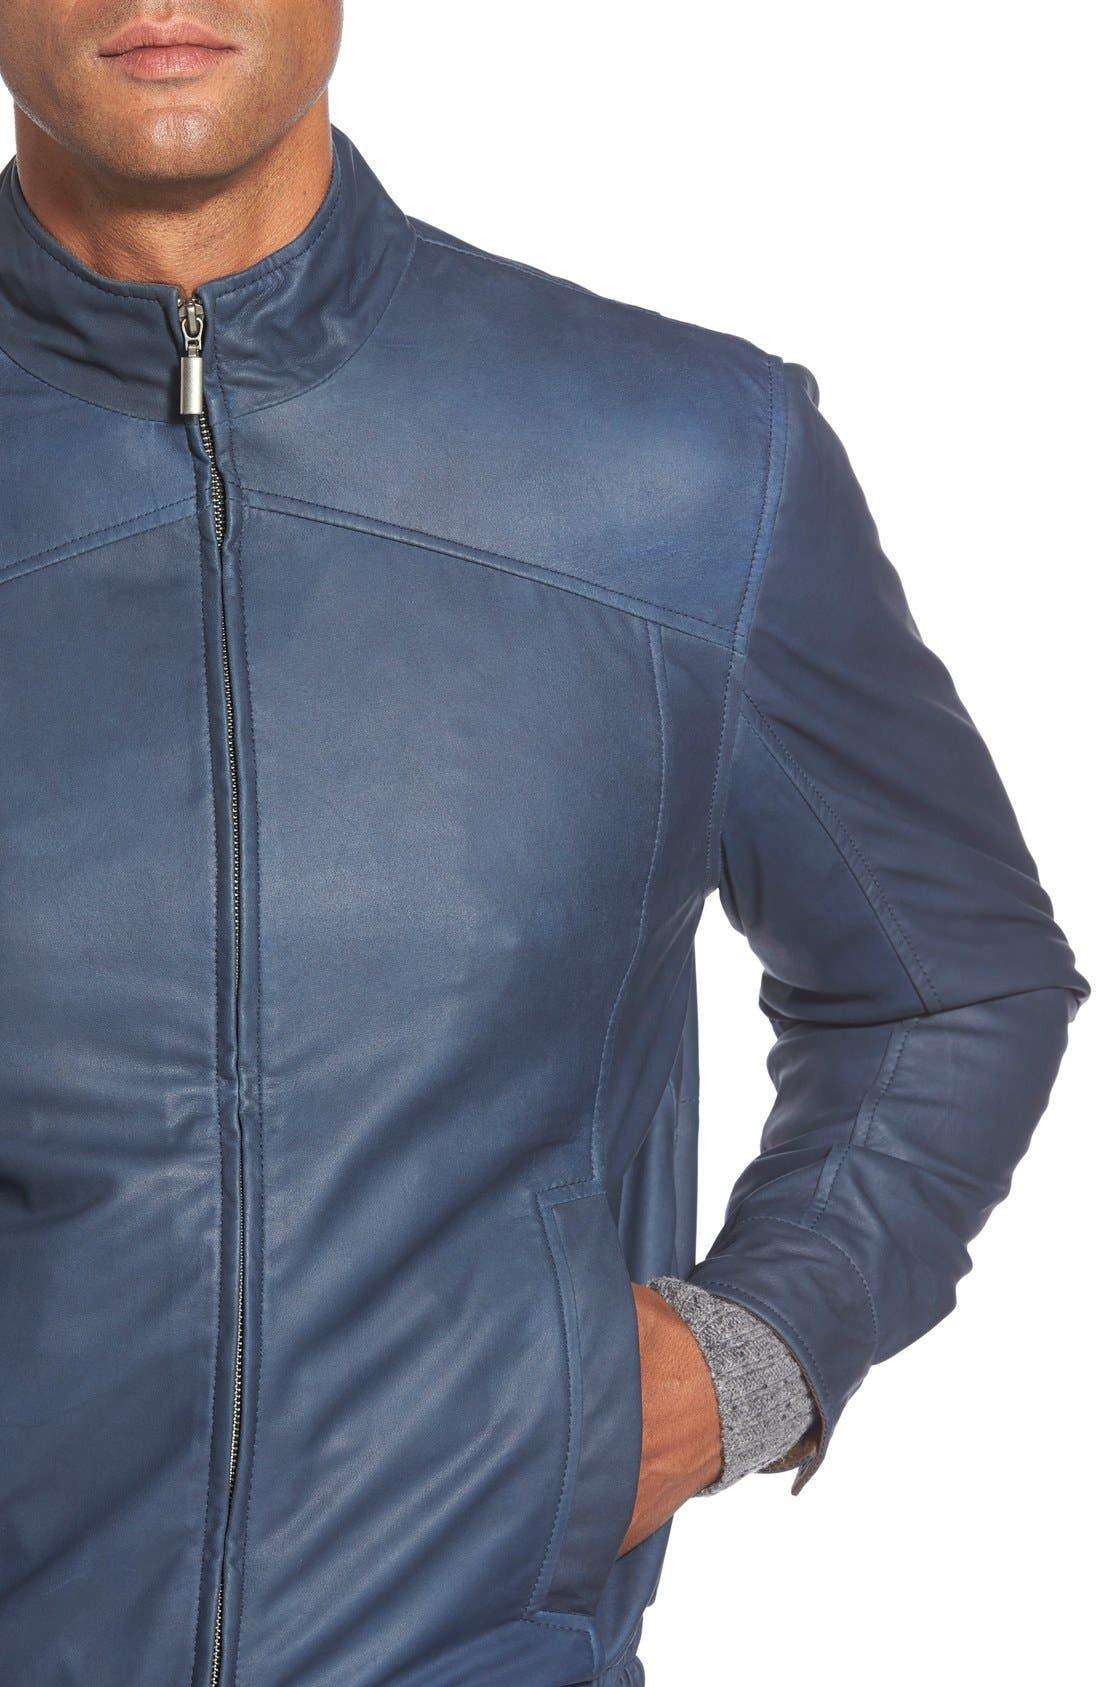 Leather Bomber Jacket,                             Alternate thumbnail 3, color,                             Navy